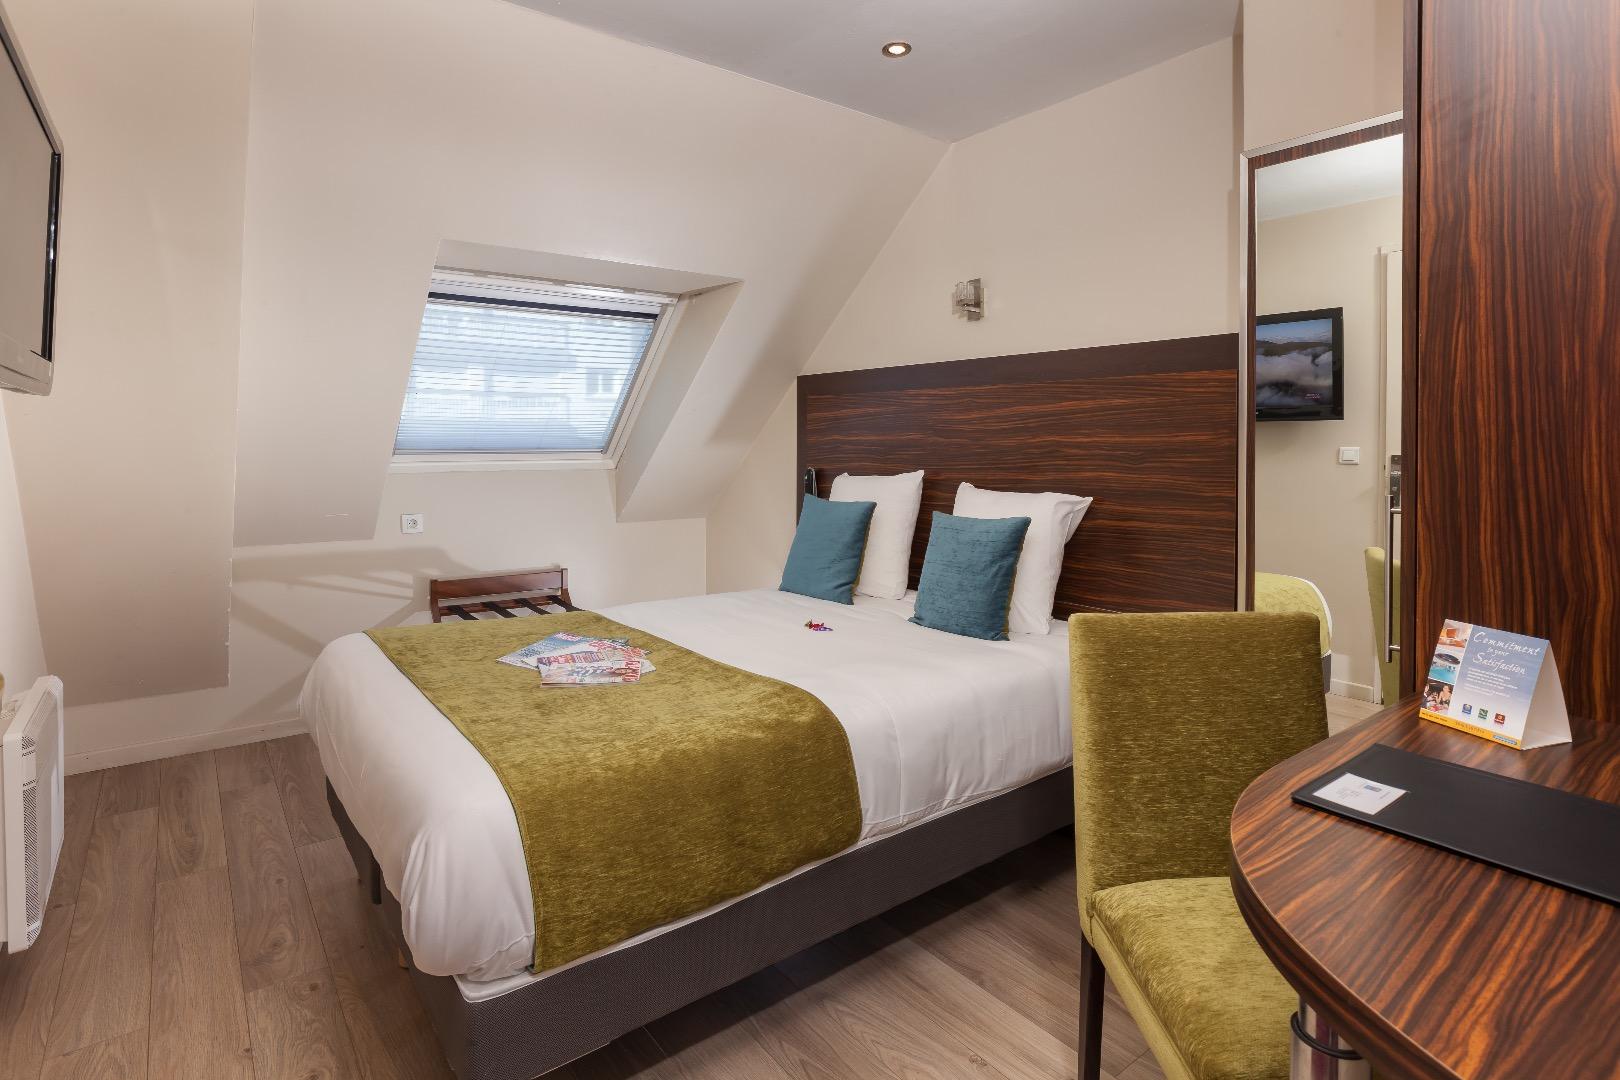 comfort hotel lamarck montmartre paris 18 site officiel. Black Bedroom Furniture Sets. Home Design Ideas